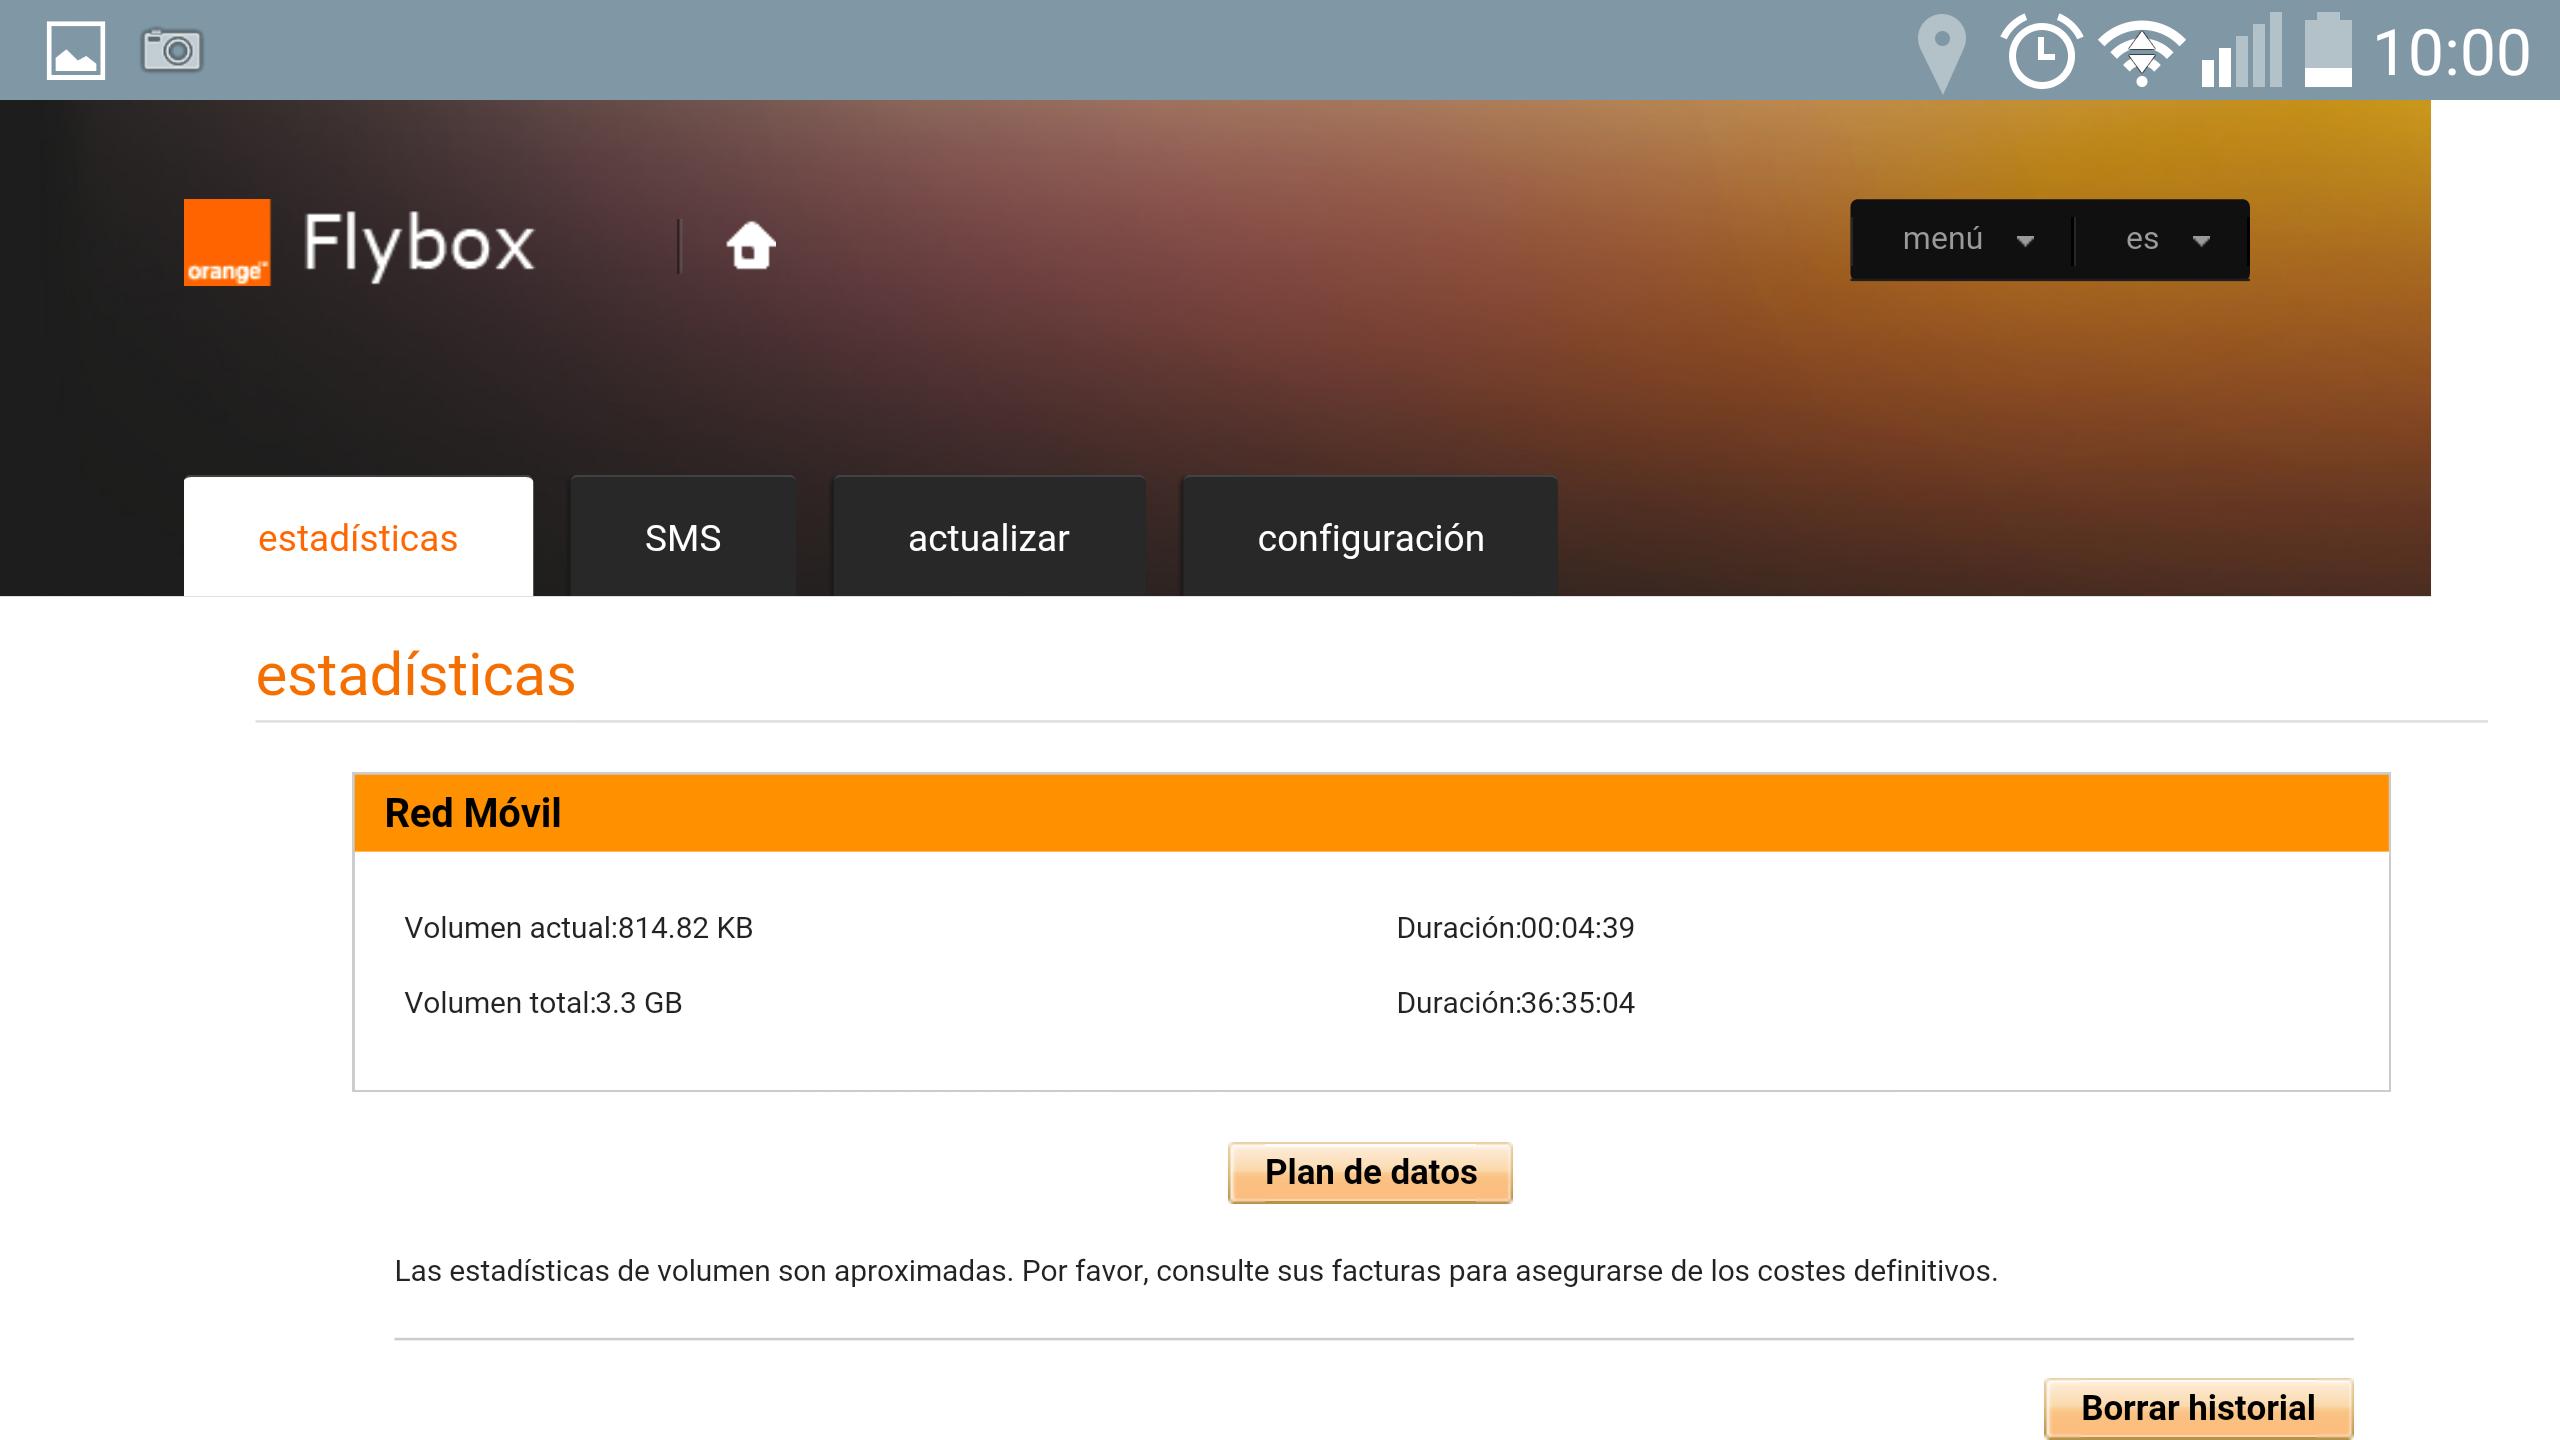 Screenshot_2015-11-18-10-00-59.png